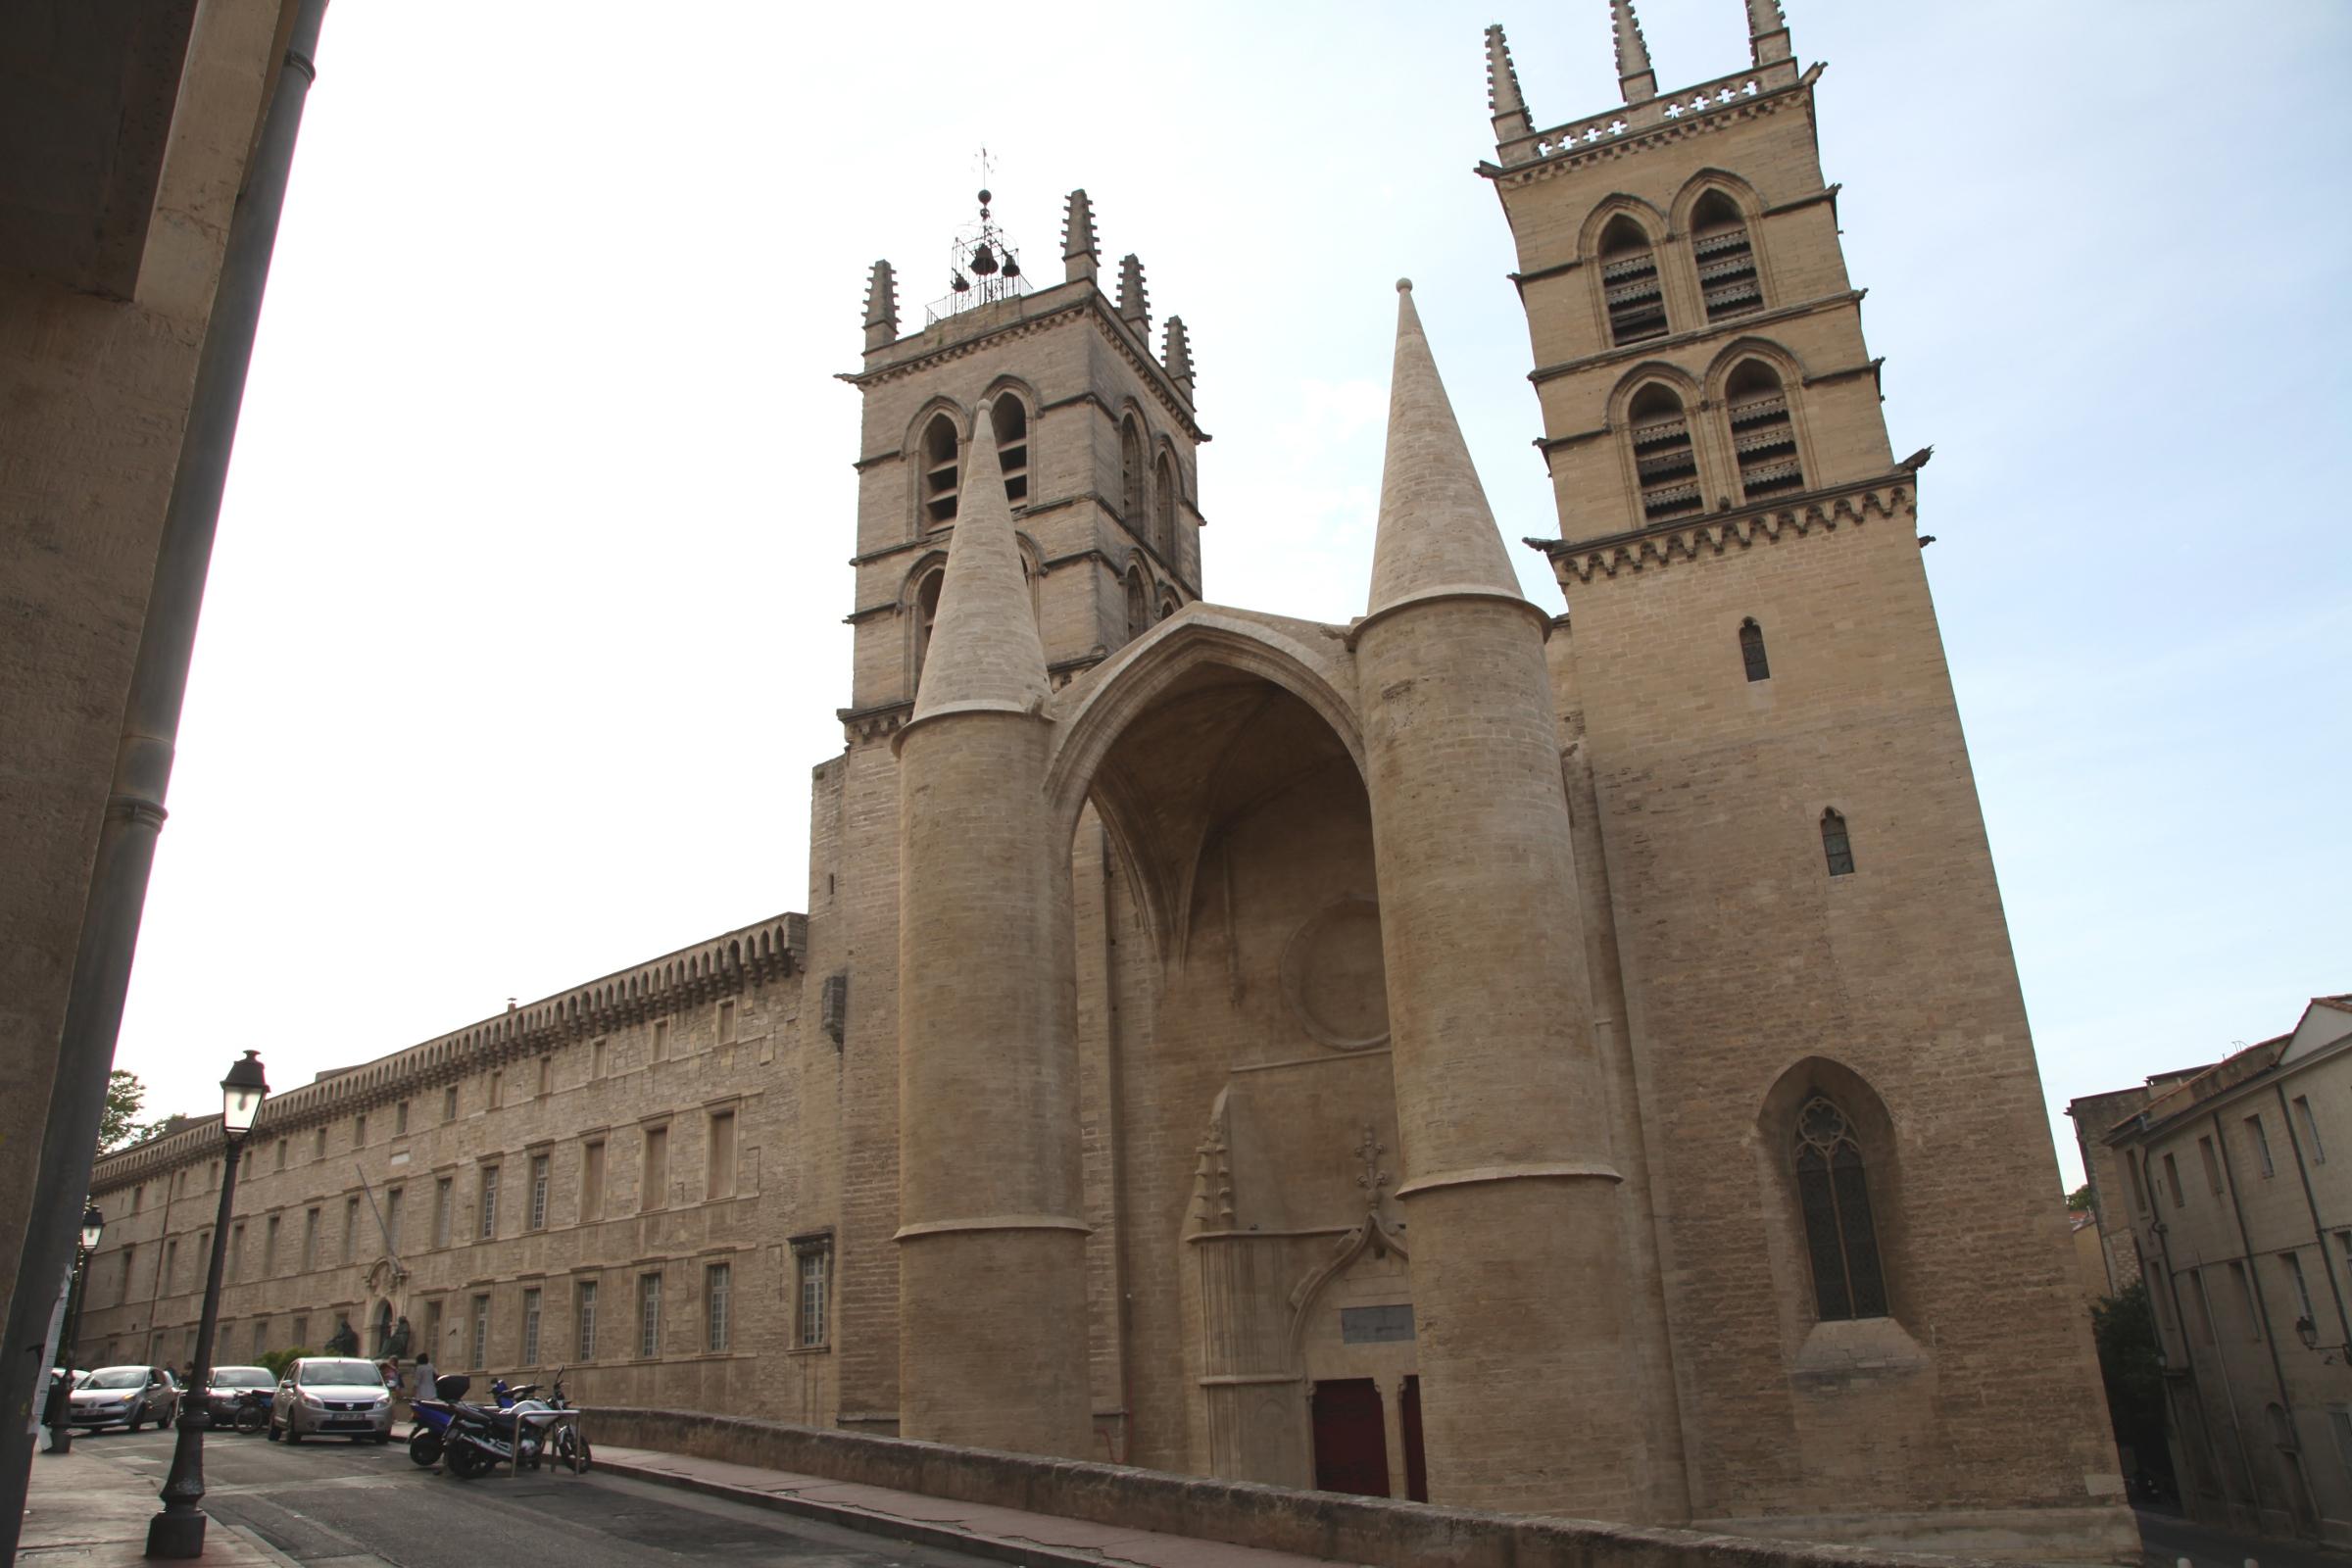 File montpellier cathedrale st pierre pa00103522 01 jpm jpg wikimedia commons - Cathedrale saint pierre de montpellier ...